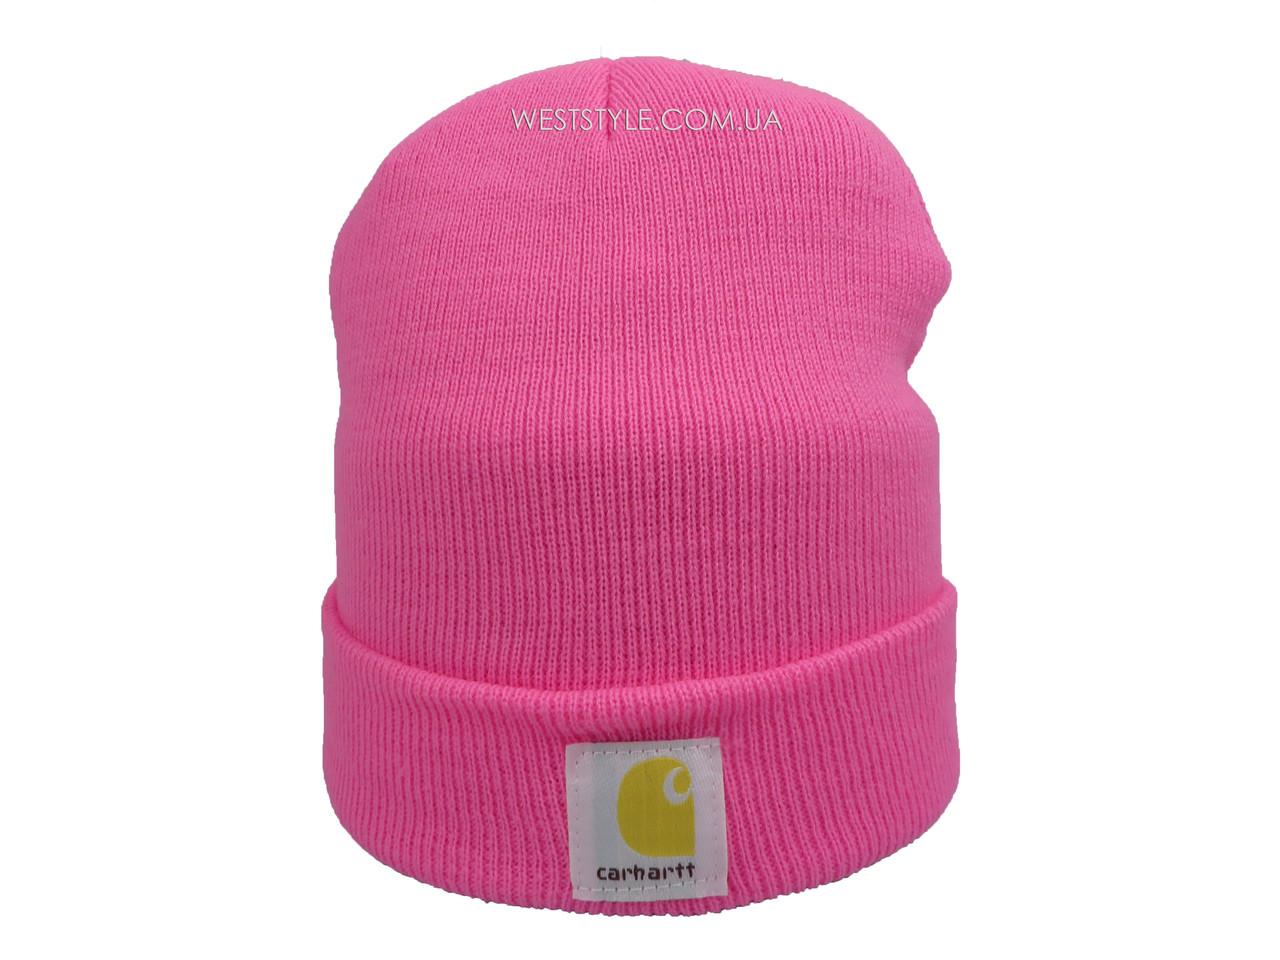 Розовая шапка Carhartt (реплика)